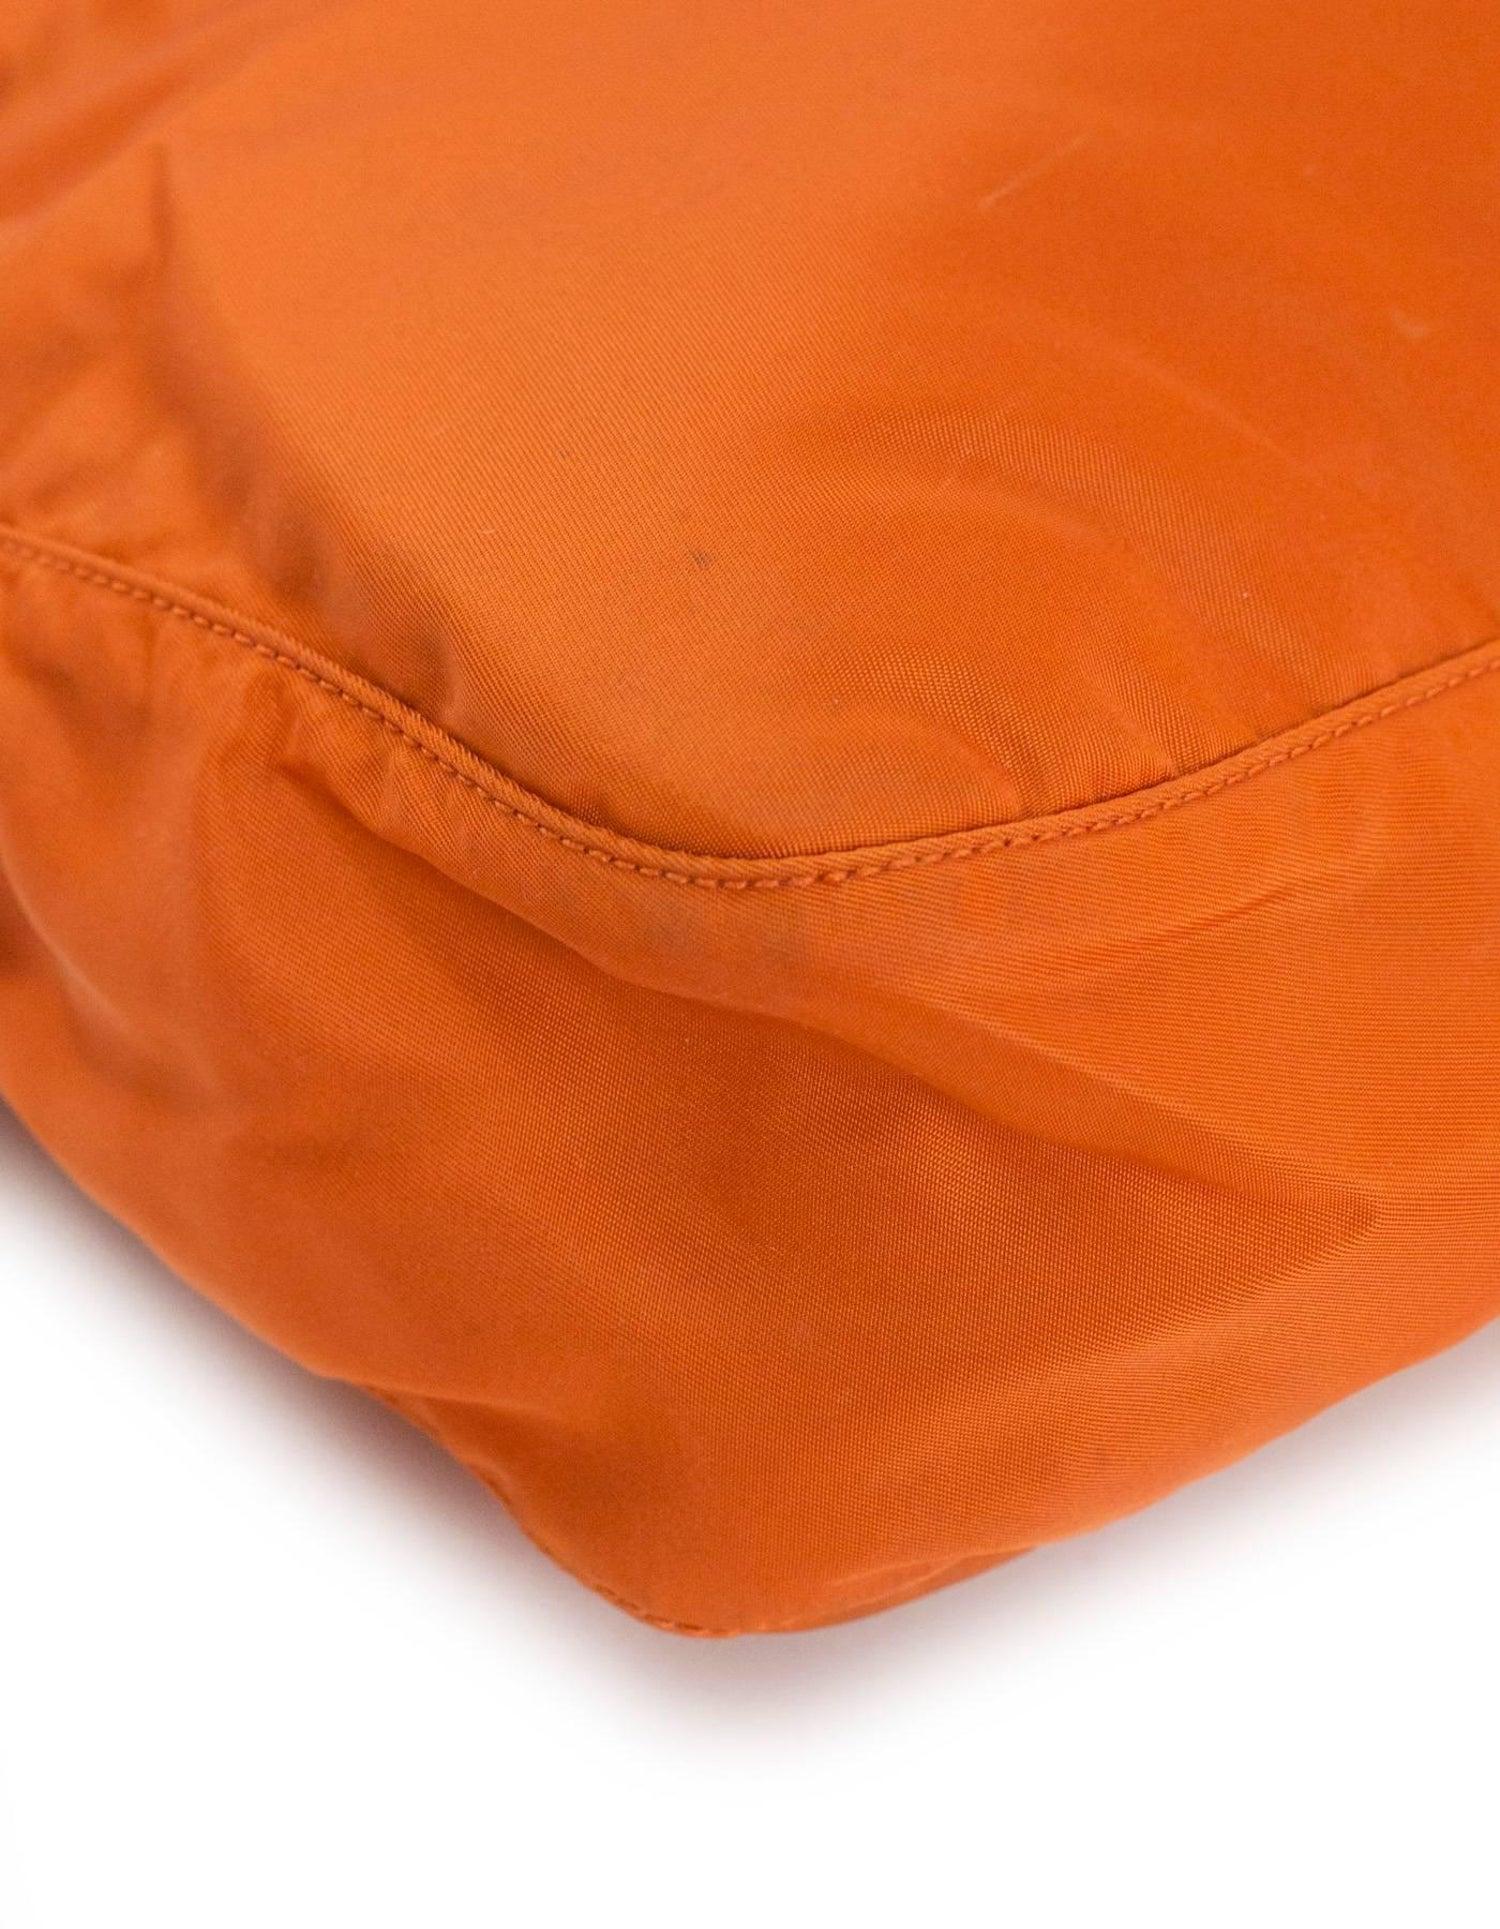 515589a067e3 Prada Orange Tessuto Nylon Messenger Crossbody Bag For Sale at 1stdibs